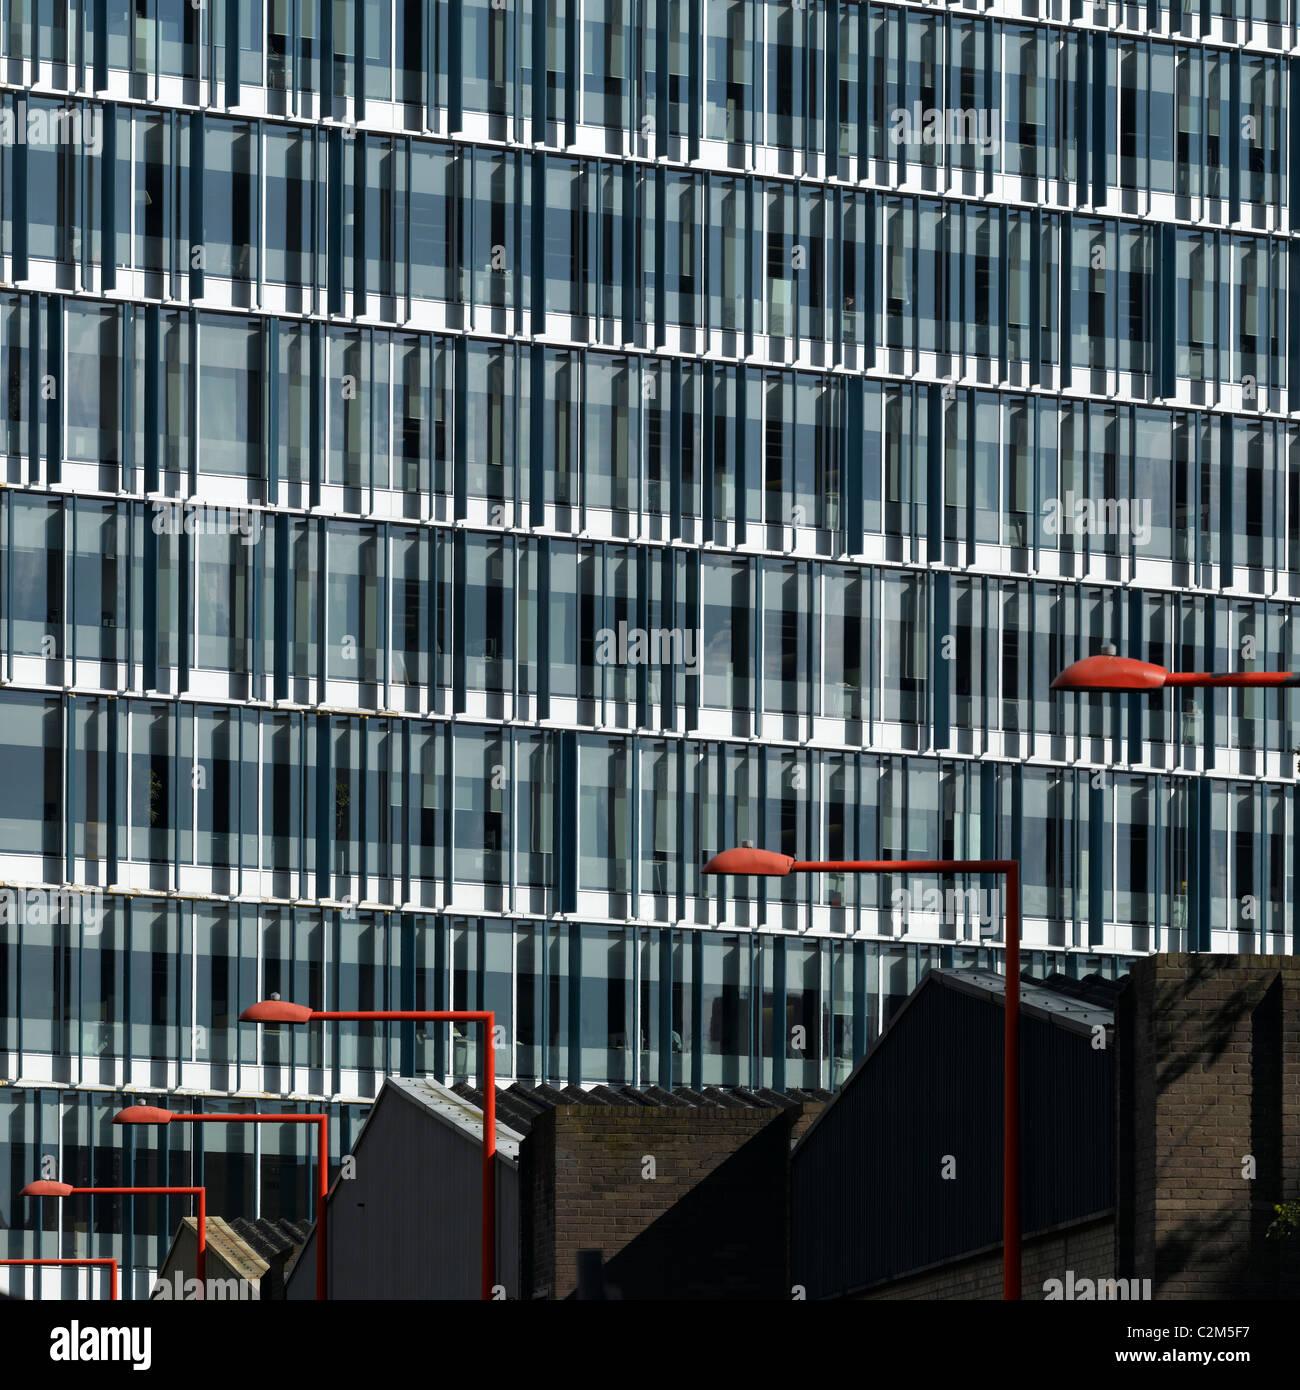 Bankside 1, Southbank, Southwark, London. - Stock Image